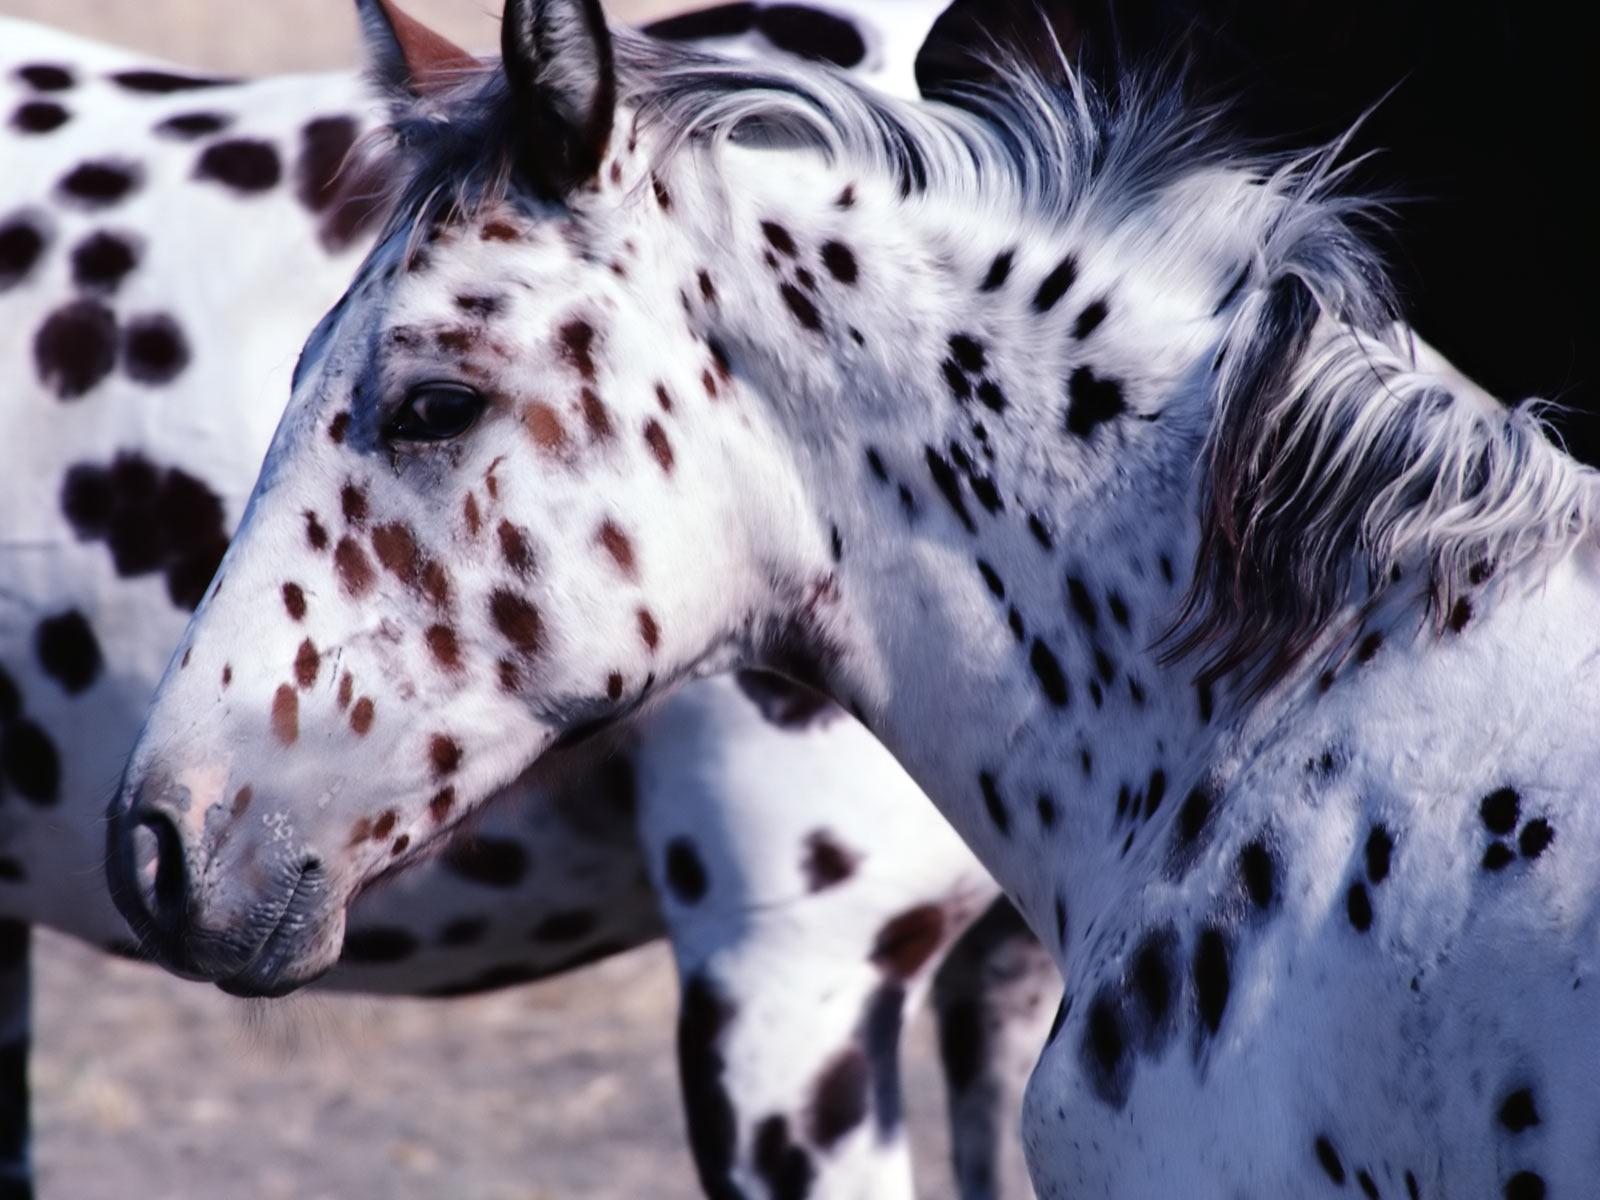 Must see Wallpaper Horse Wolf - the-best-top-desktop-horse-wallpapers-5  Pic_804316.jpeg